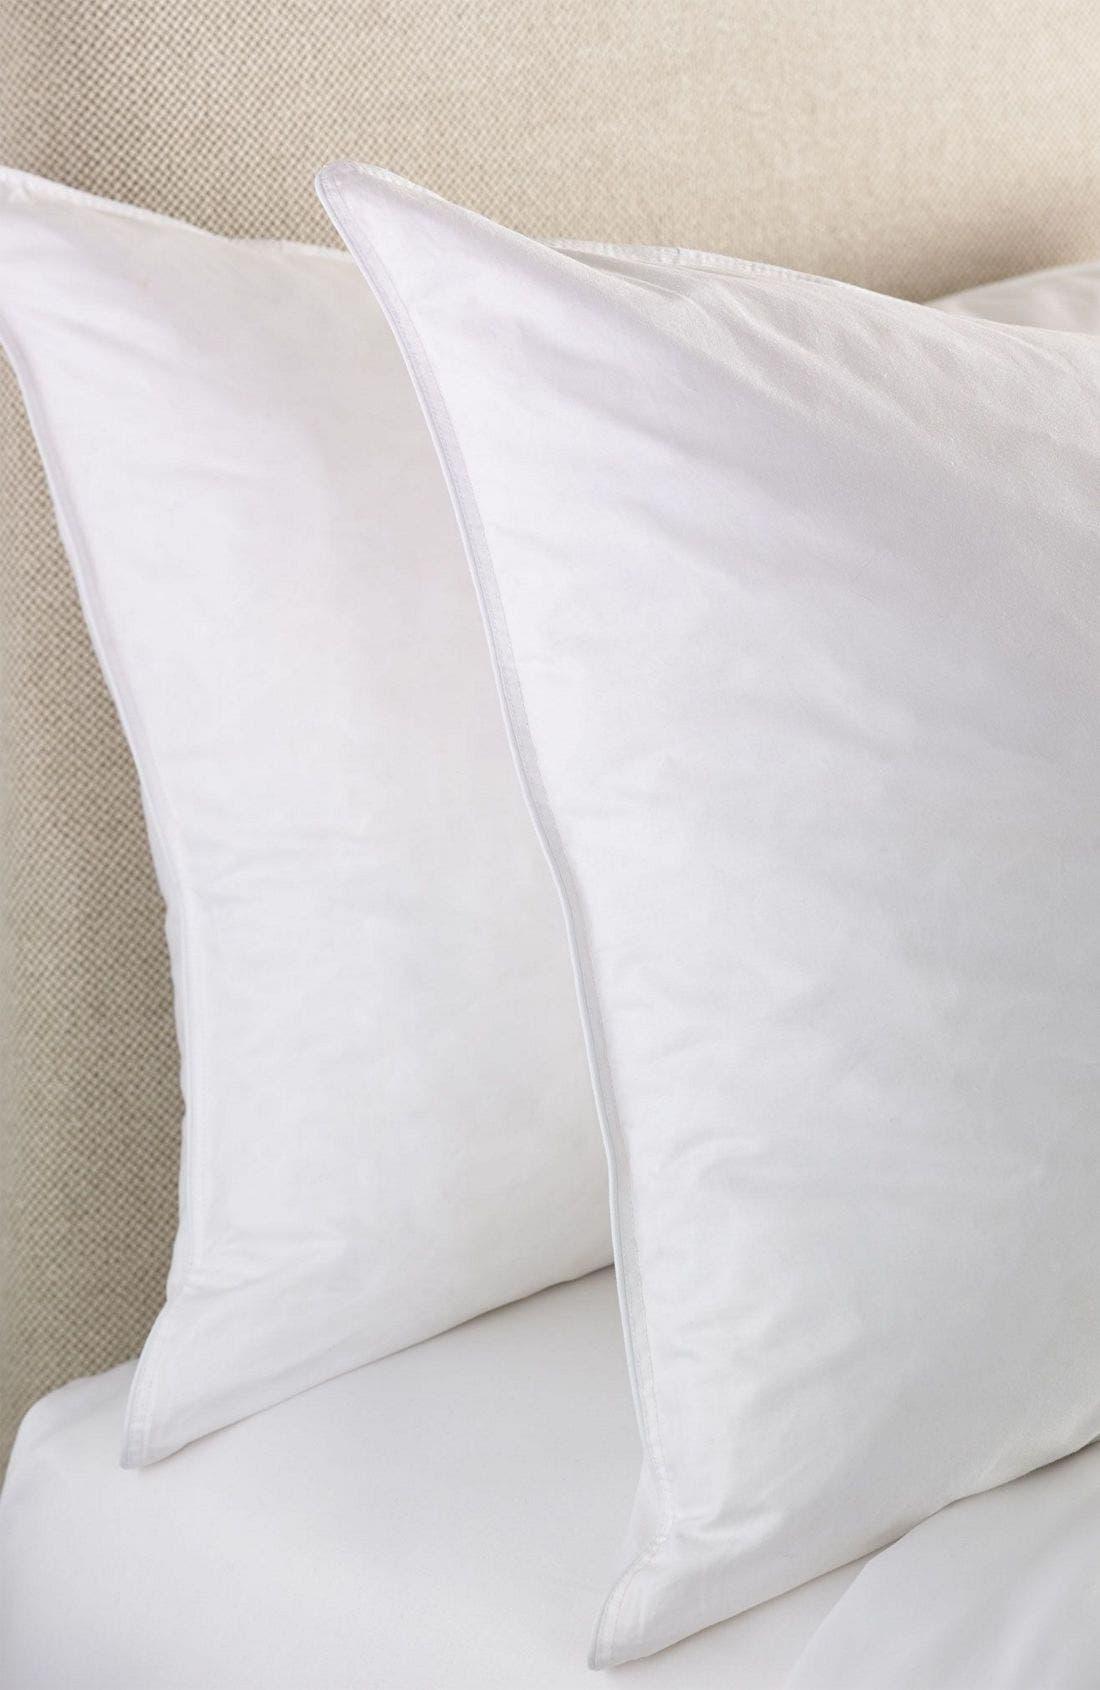 Feather & Down Pillow,                             Alternate thumbnail 2, color,                             White